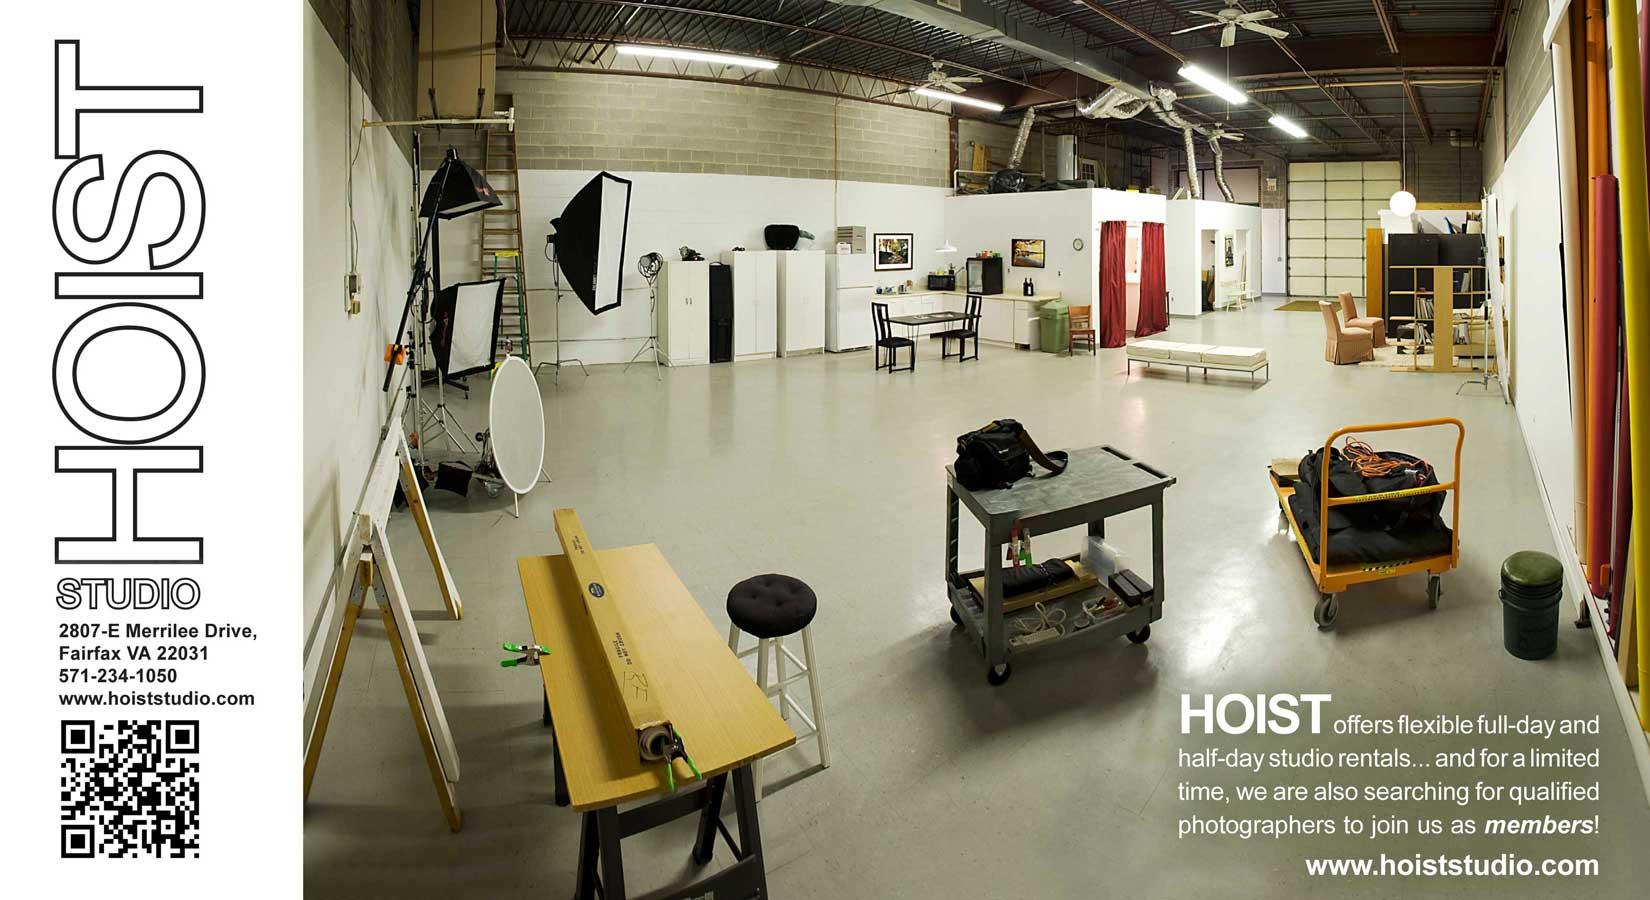 hoist_studio_1